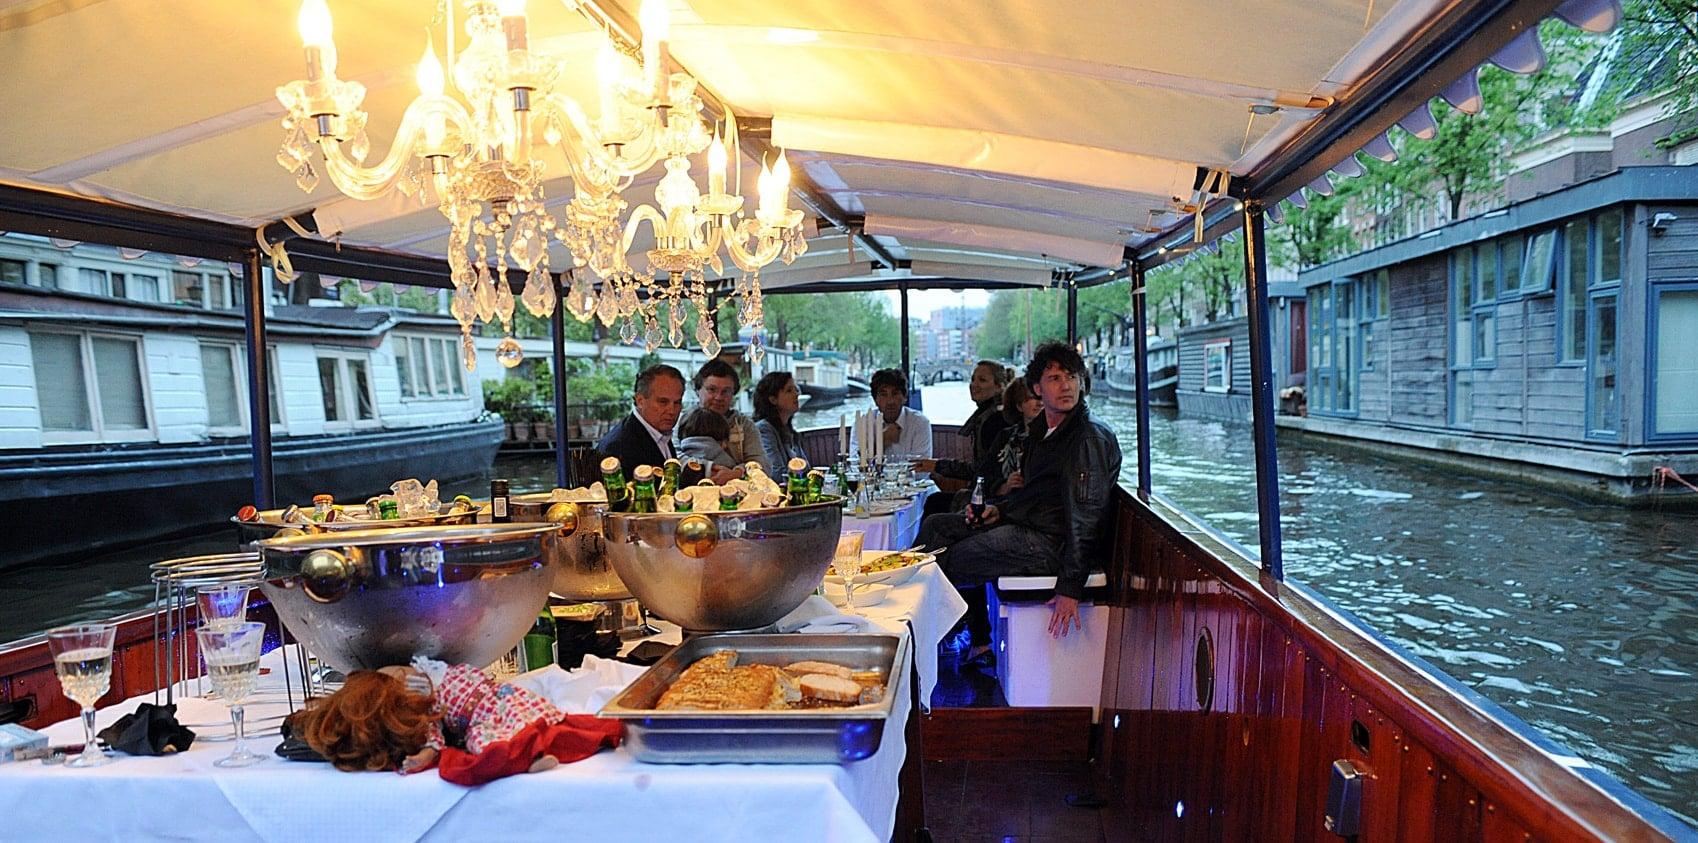 Amsterdam Dinner cruise, rondvaart Amsterdam met eten